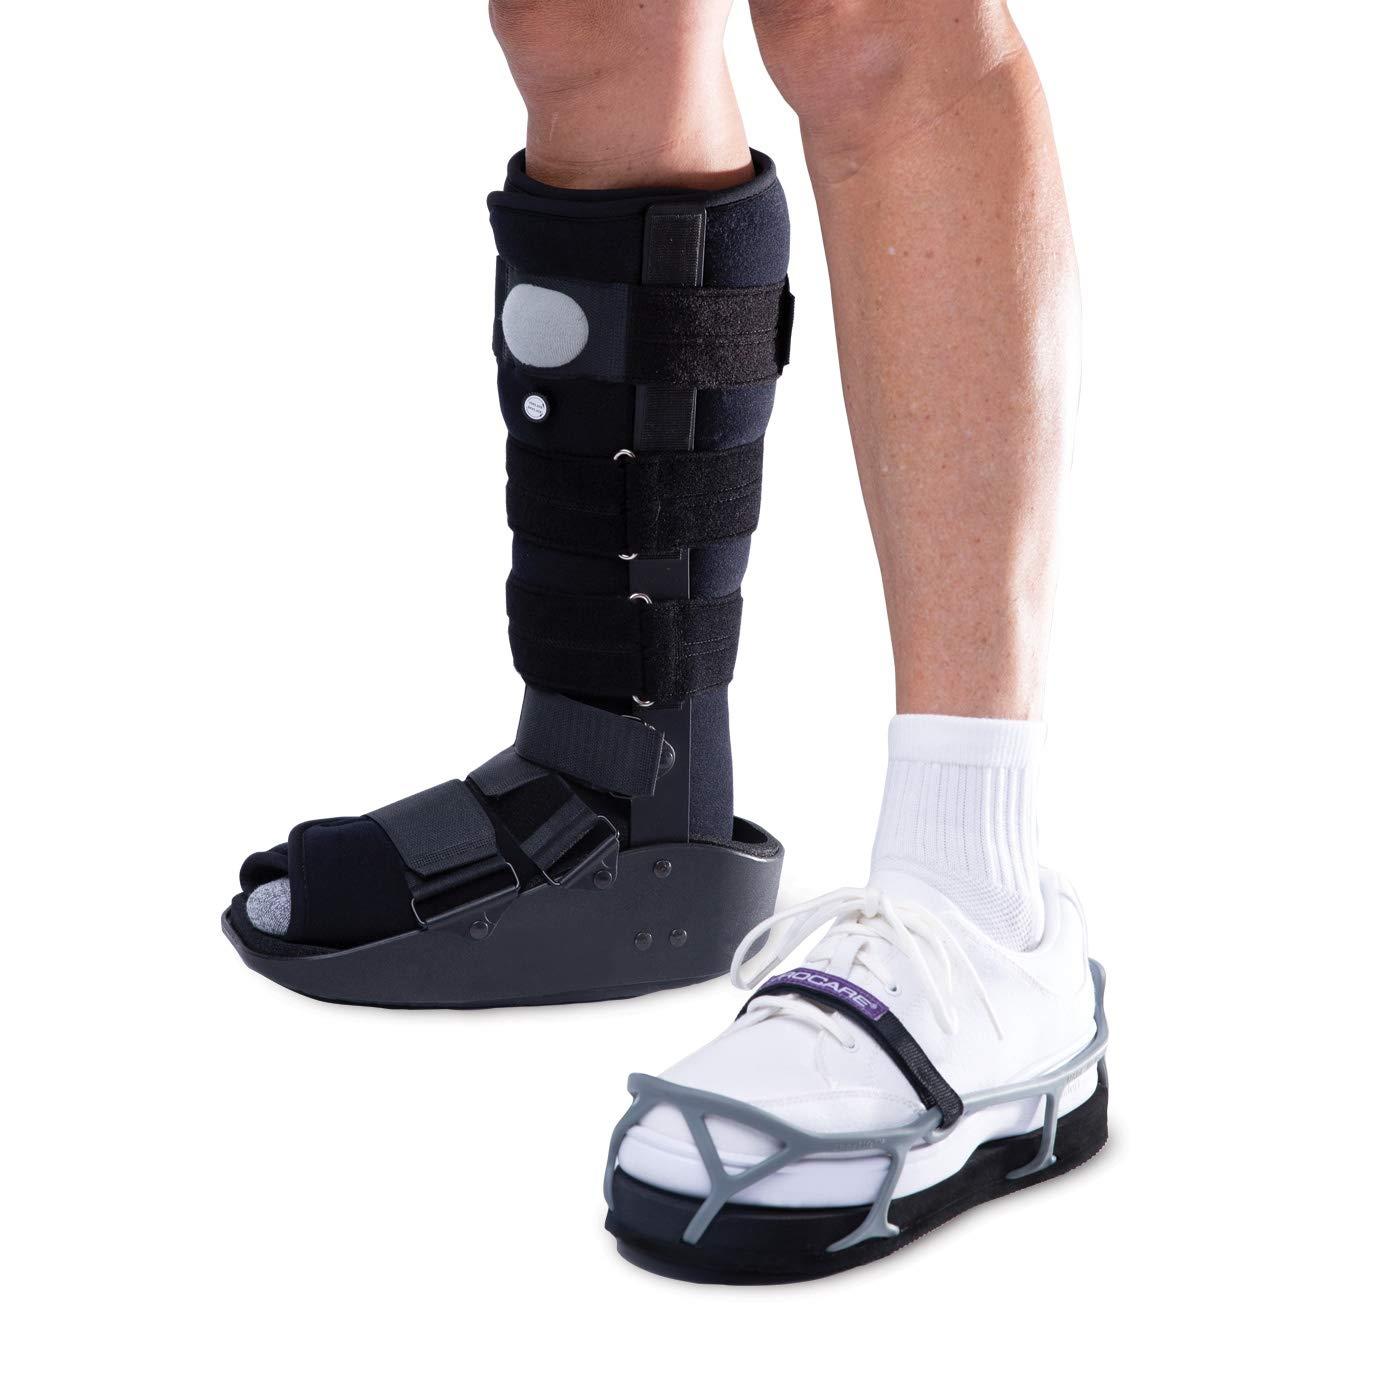 Procare ShoeLift Shoe Balancer, Small (Shoe Size: Men's 7-8.5 / Women's 6-9.5)